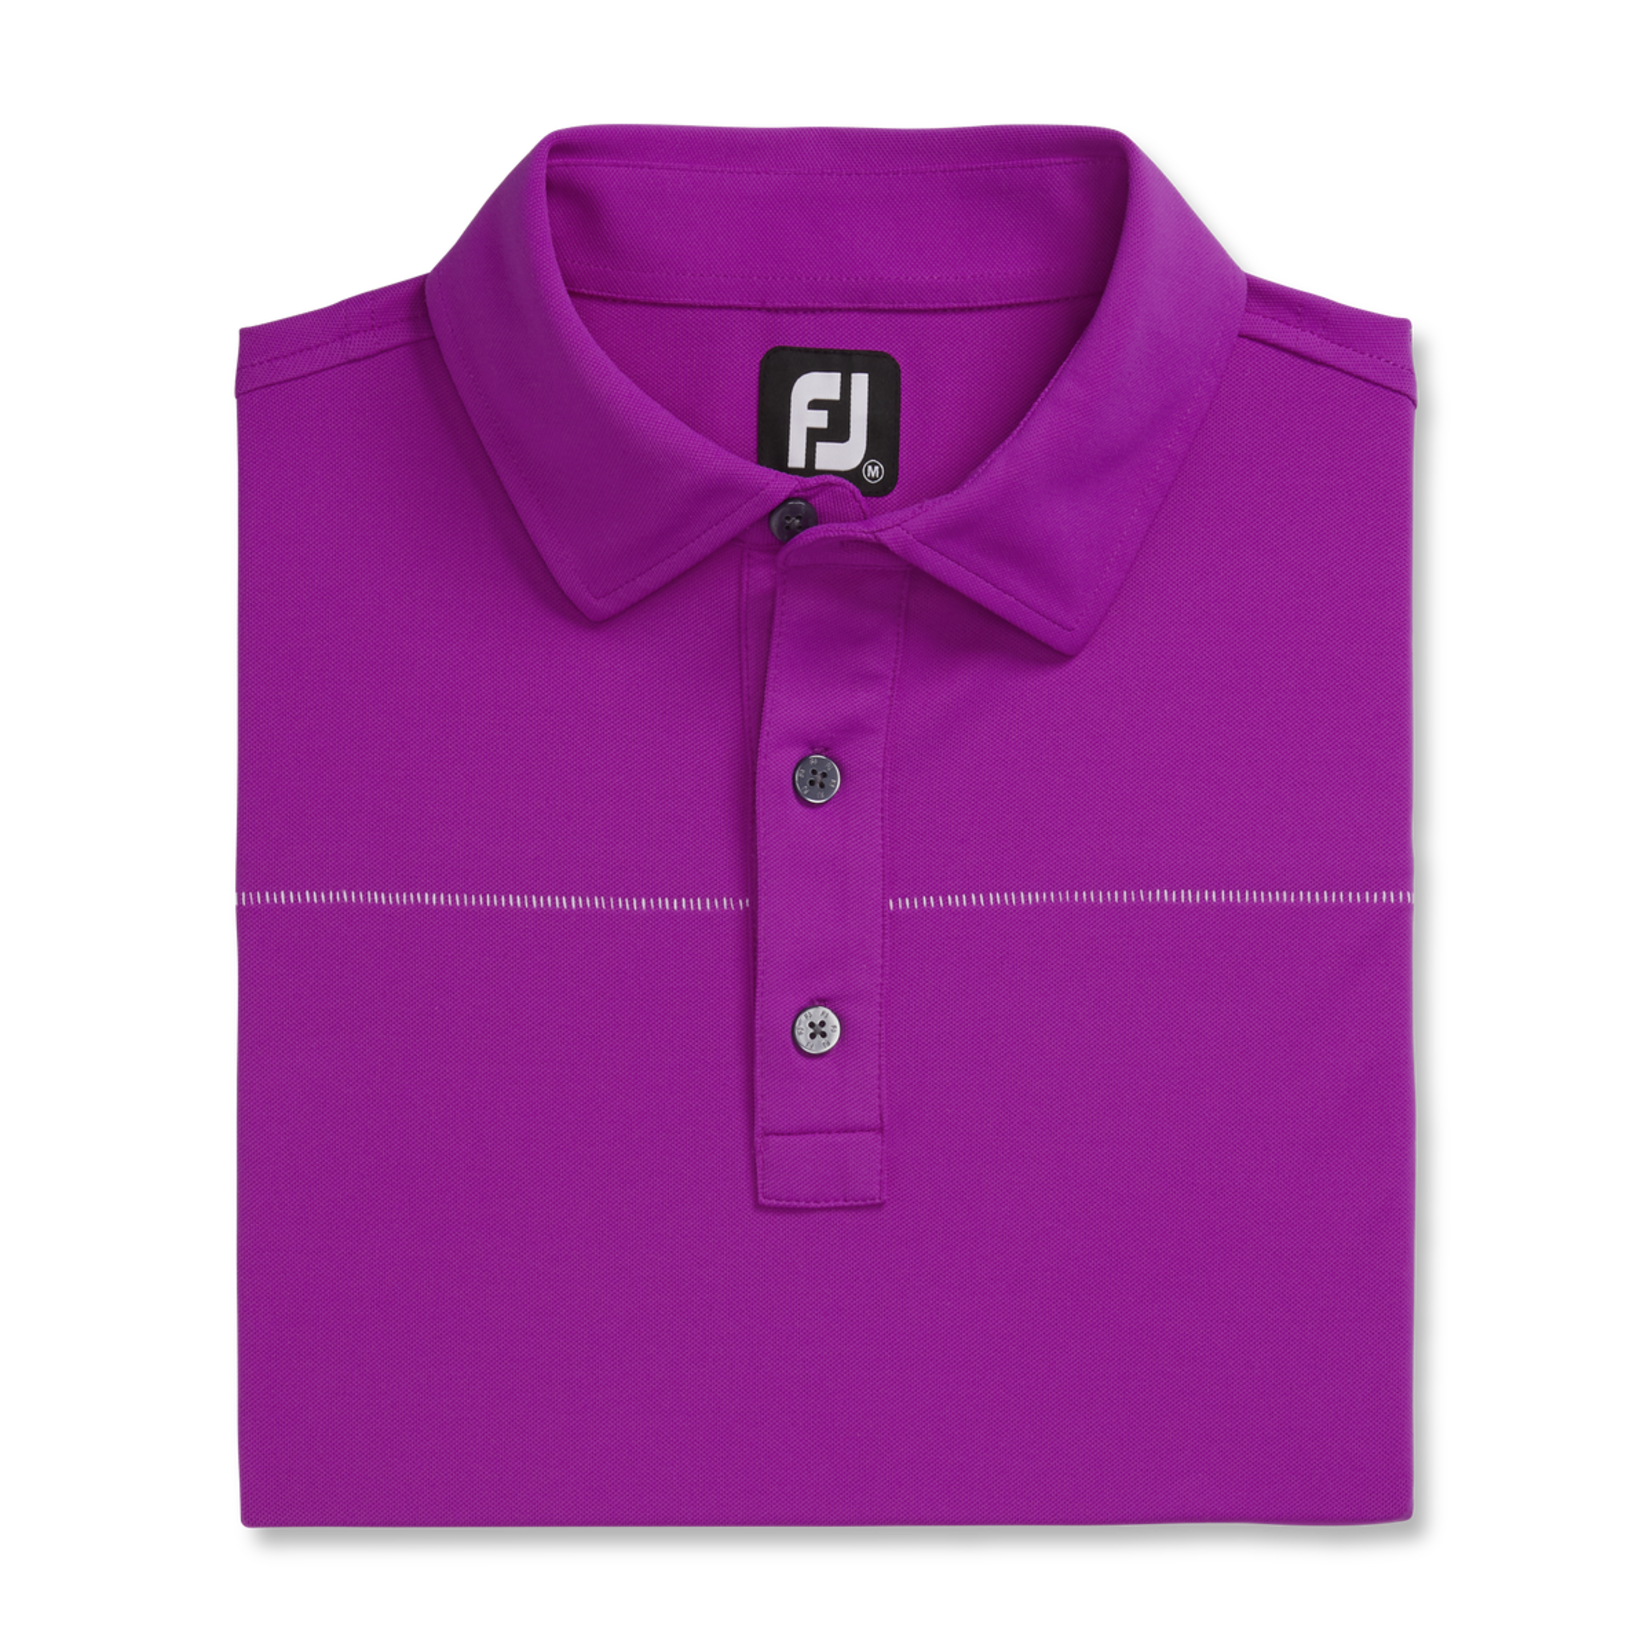 Footjoy FJ Pique Solid Spine Stitch Polo '21